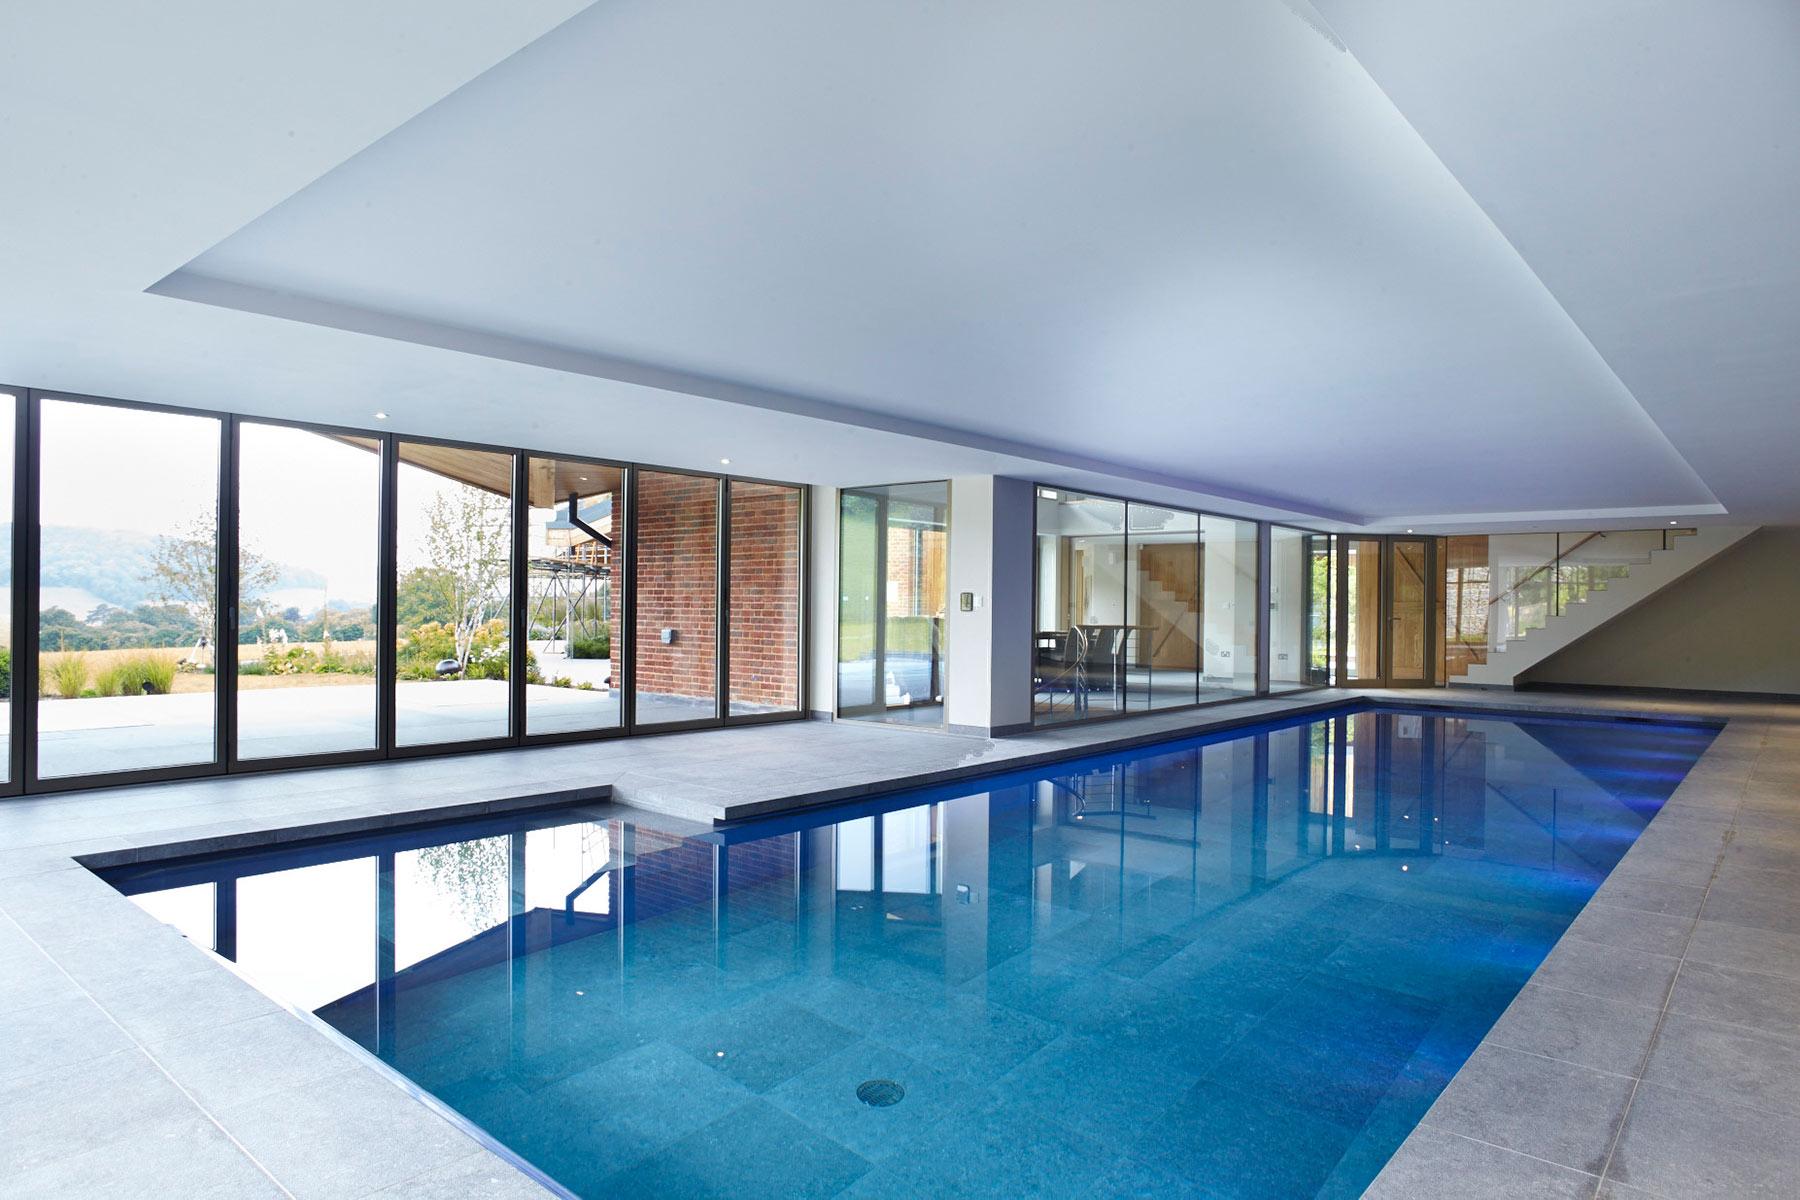 Indoor Swimming Pool with Lighting in Buckinghamshire